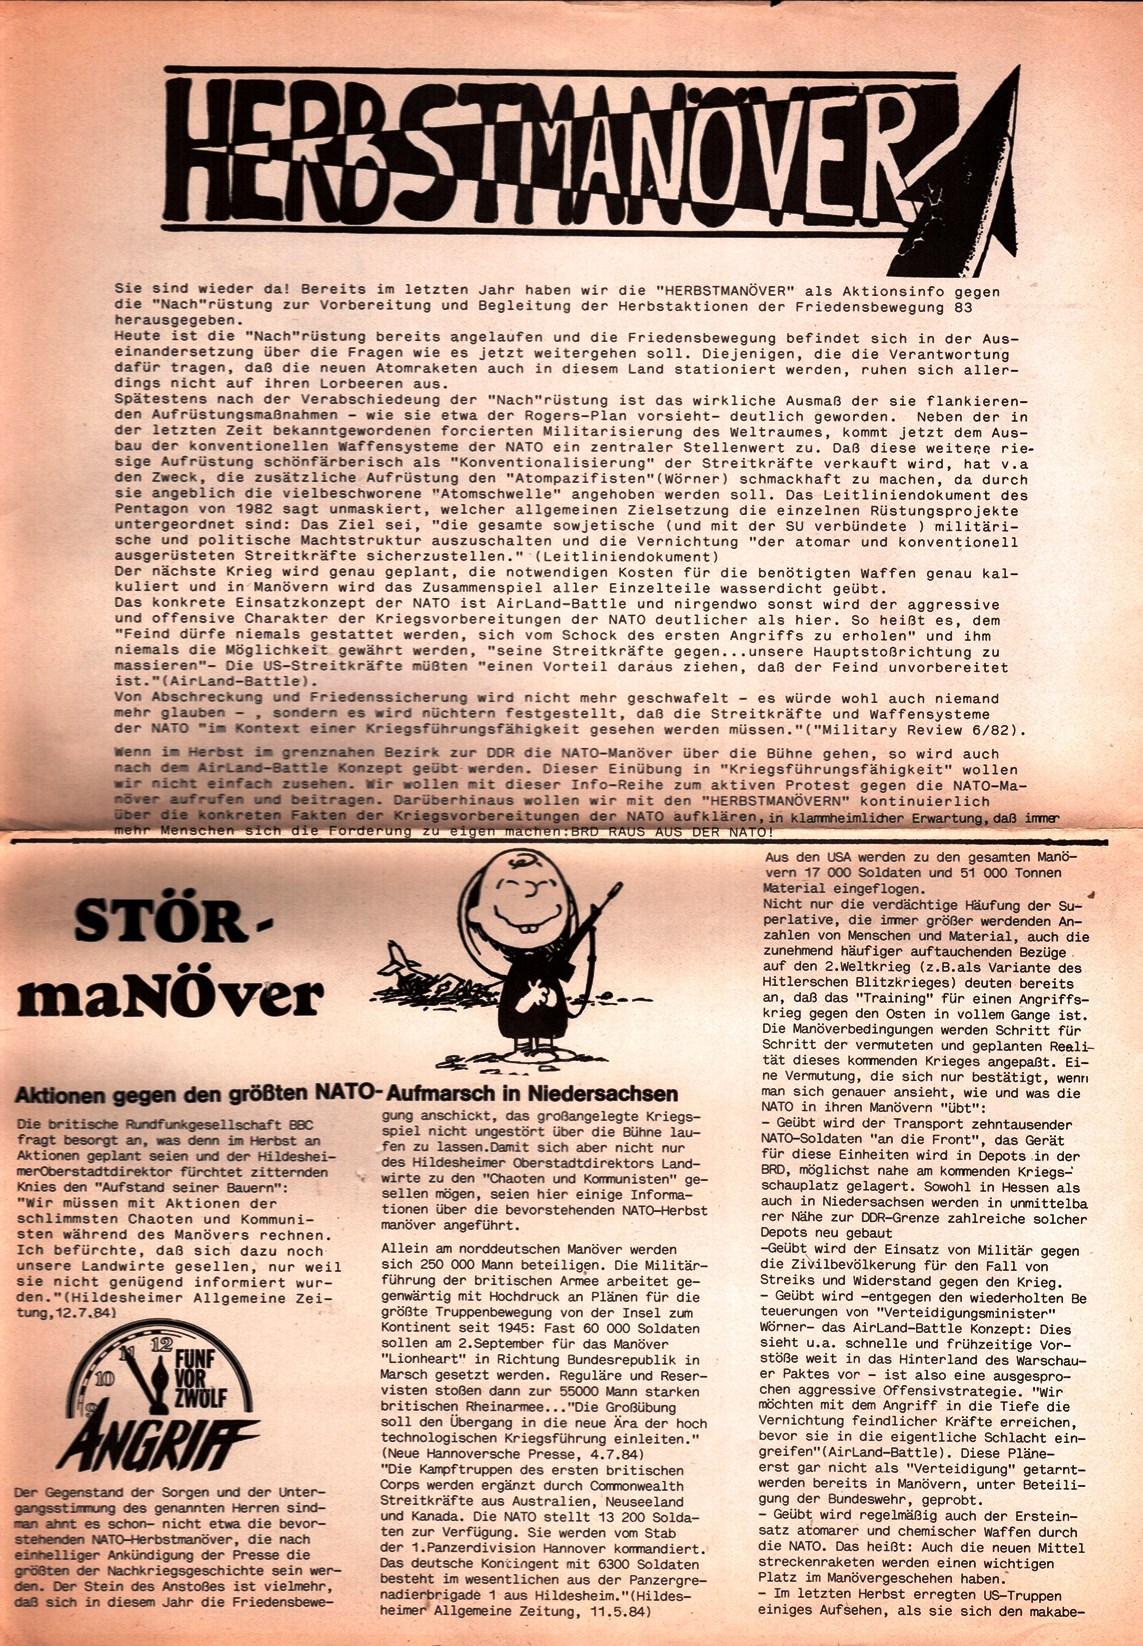 Hildesheim_1984_Manoeverbehinderung_007